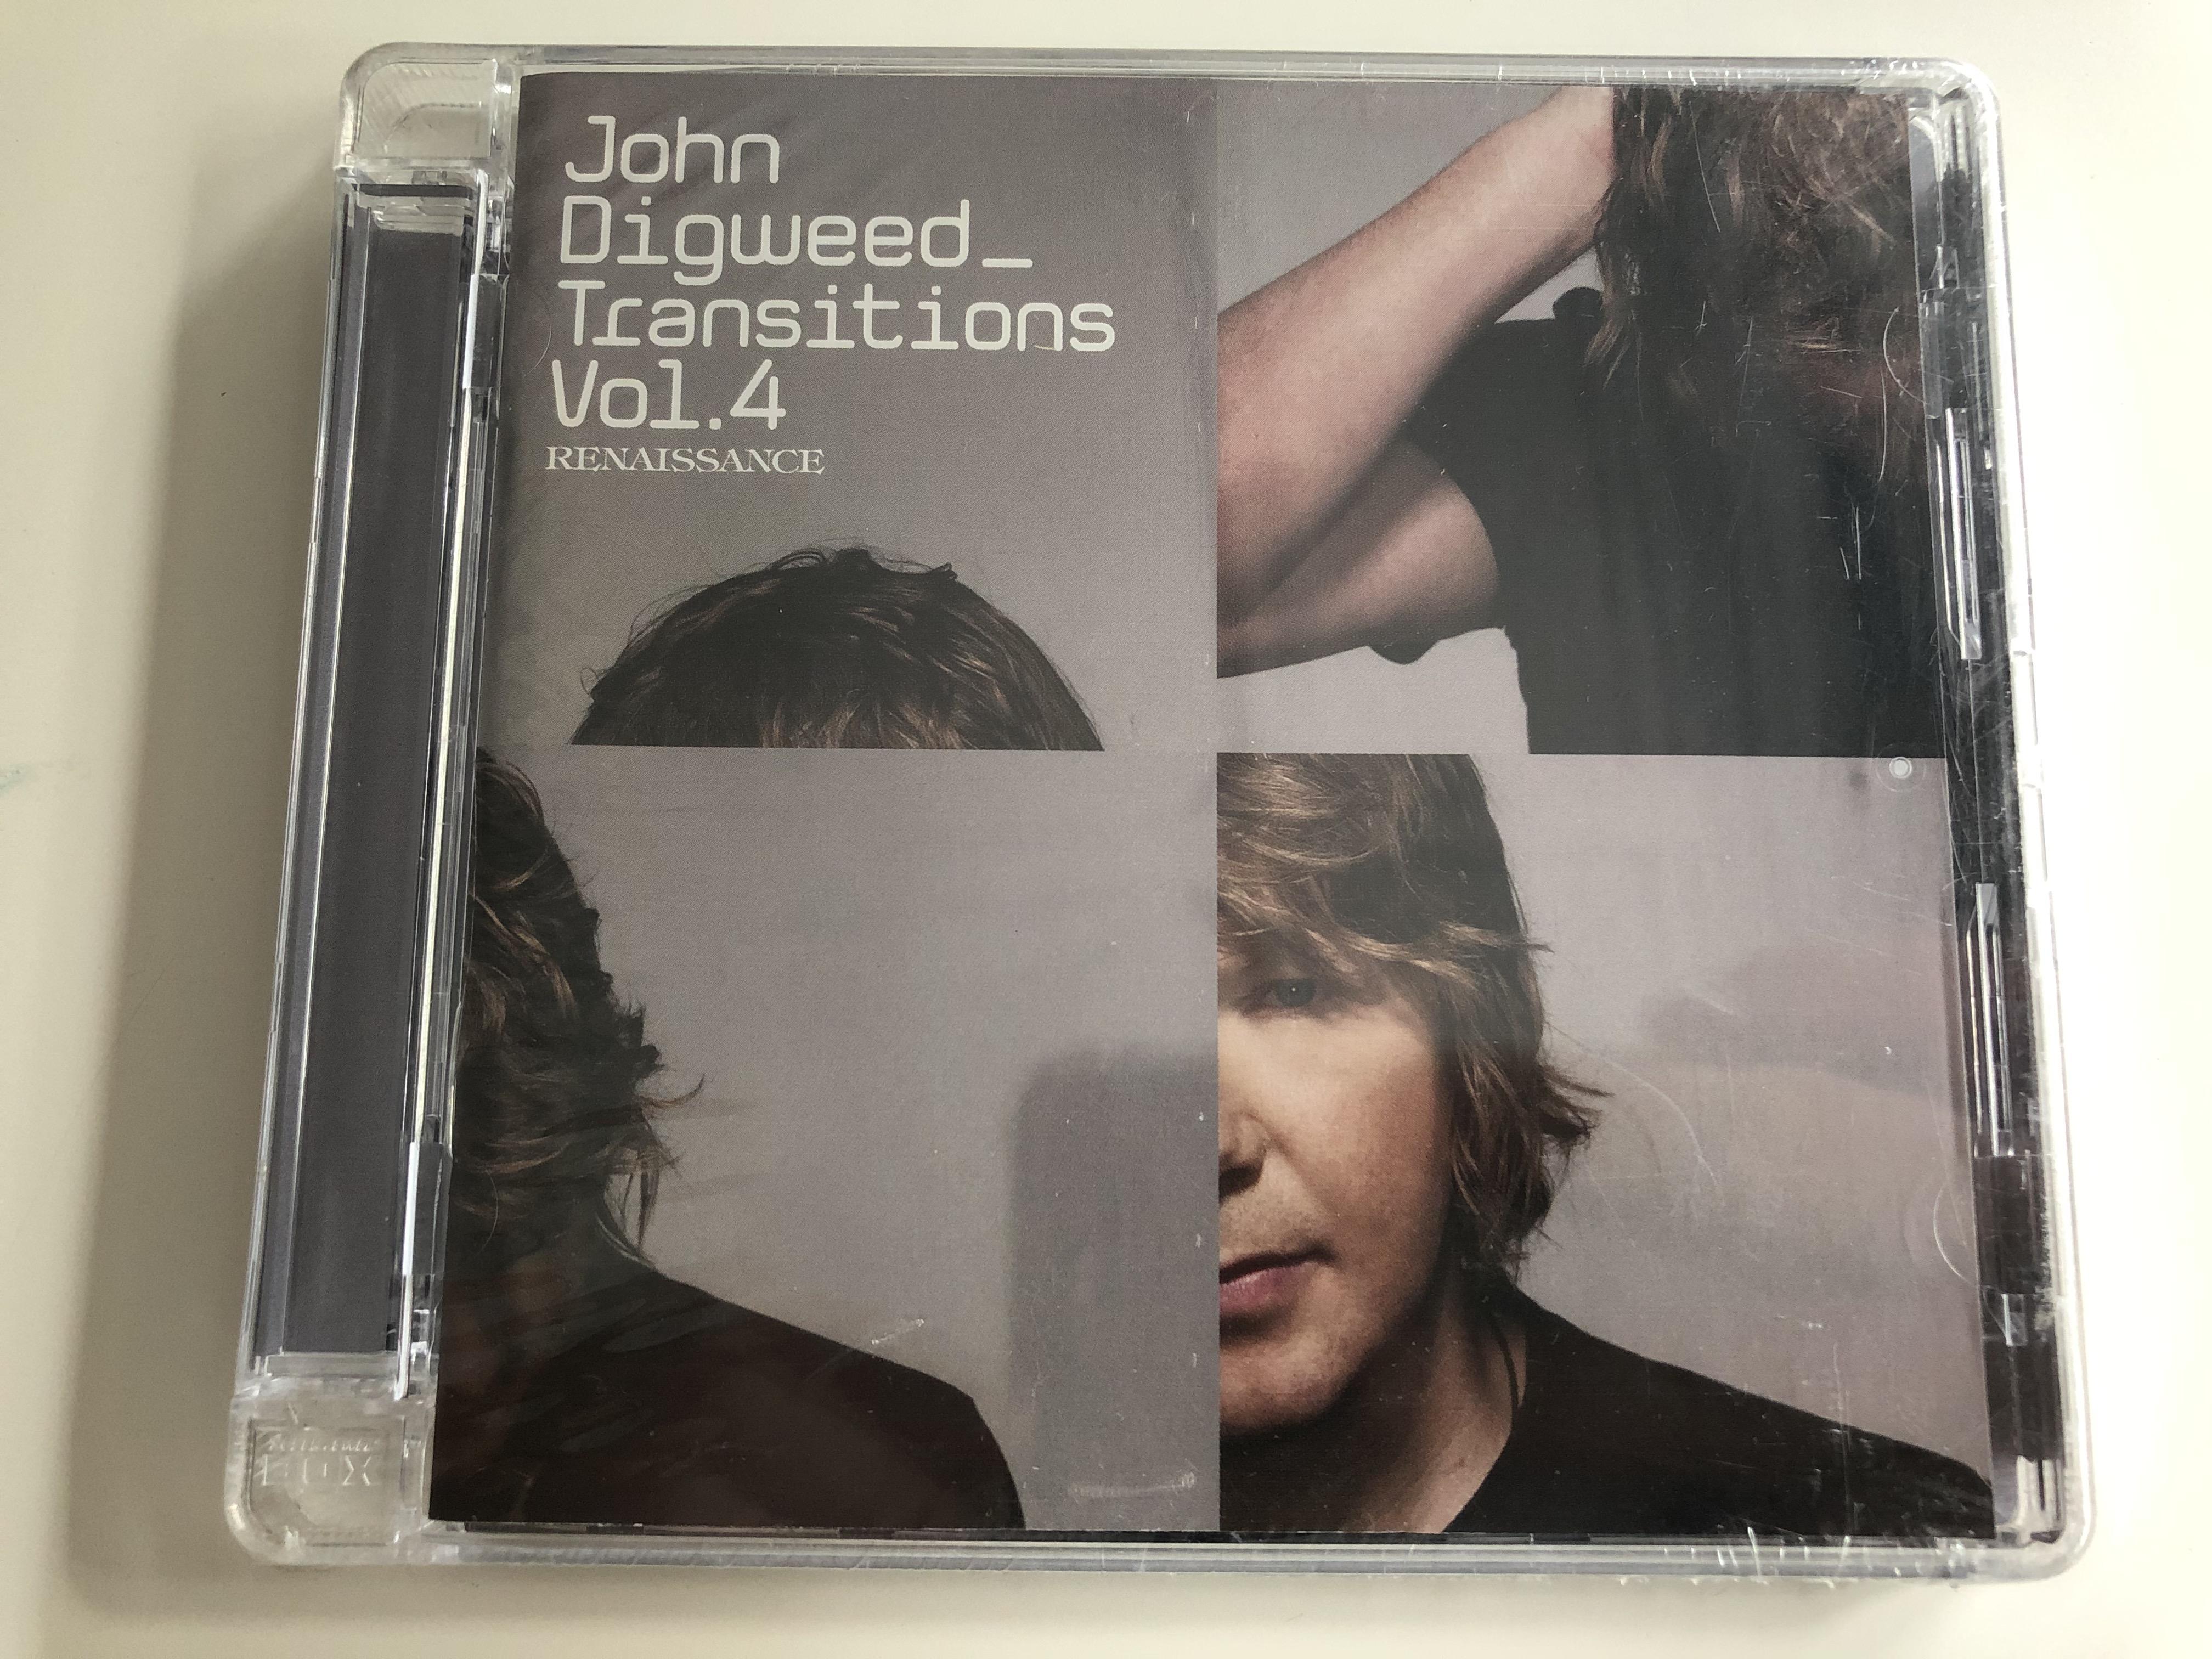 john-digweed-transitions-vol.4-renaissance-2x-audio-cd-2008-ren42cd-1-.jpg